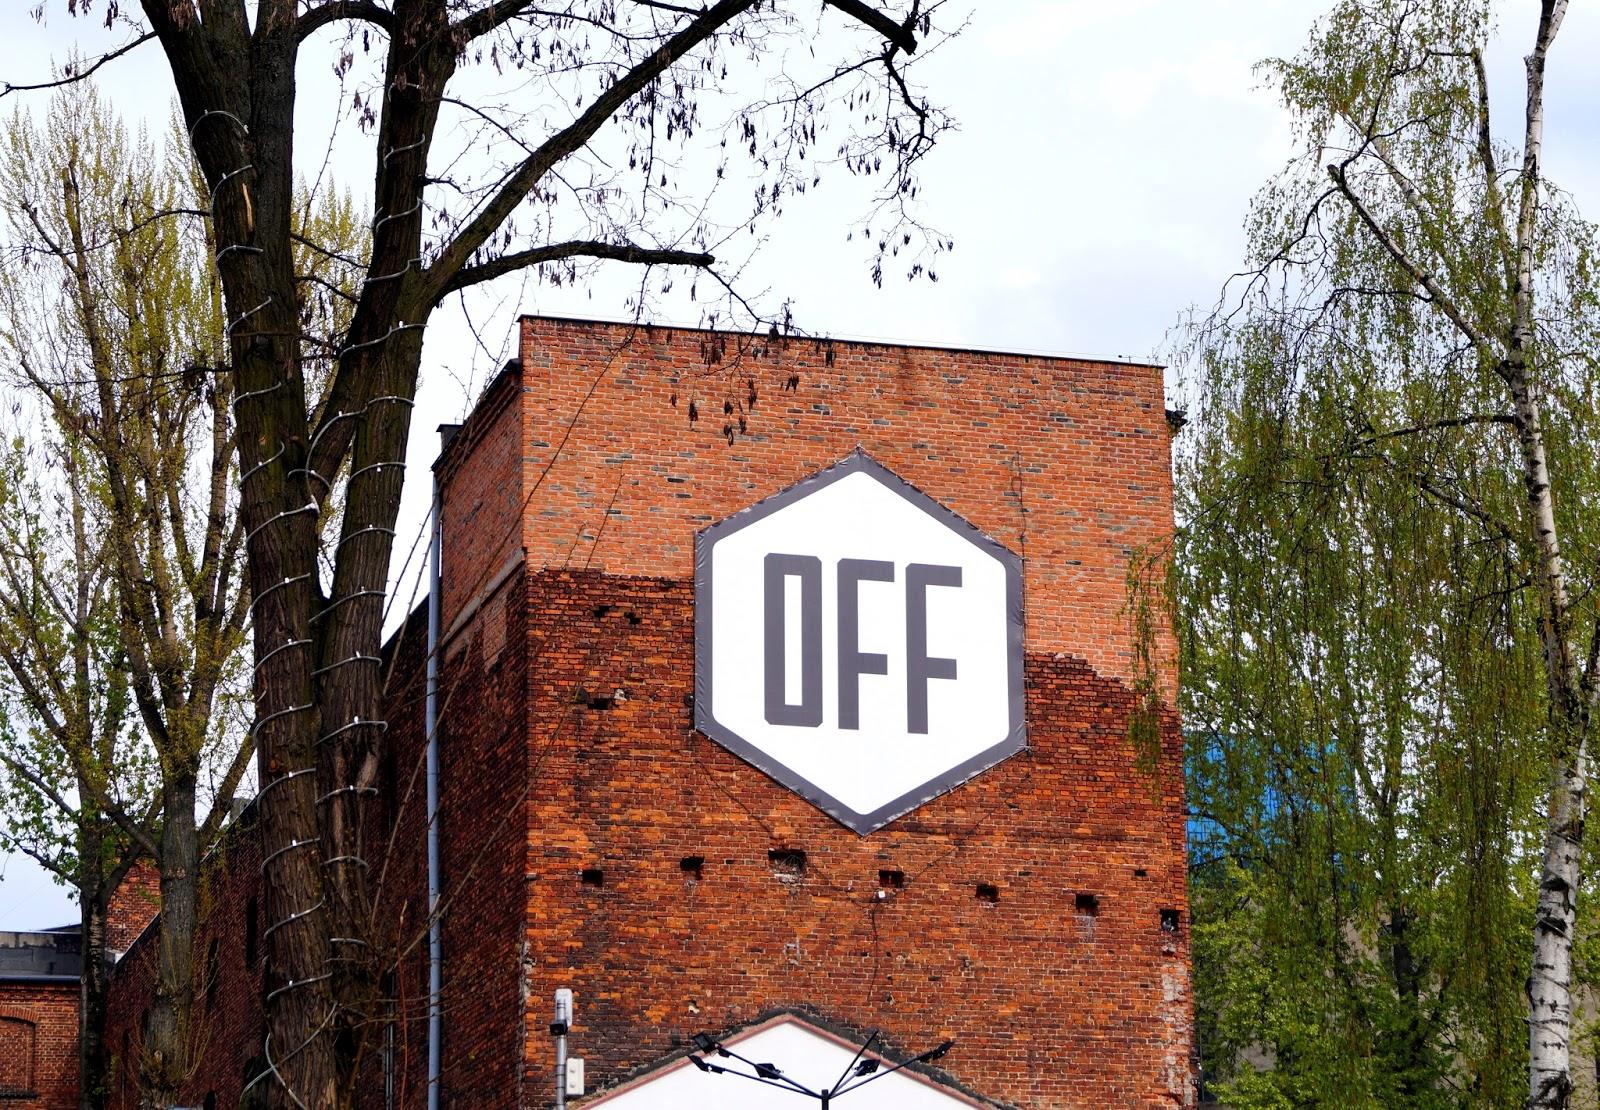 Off Lodz